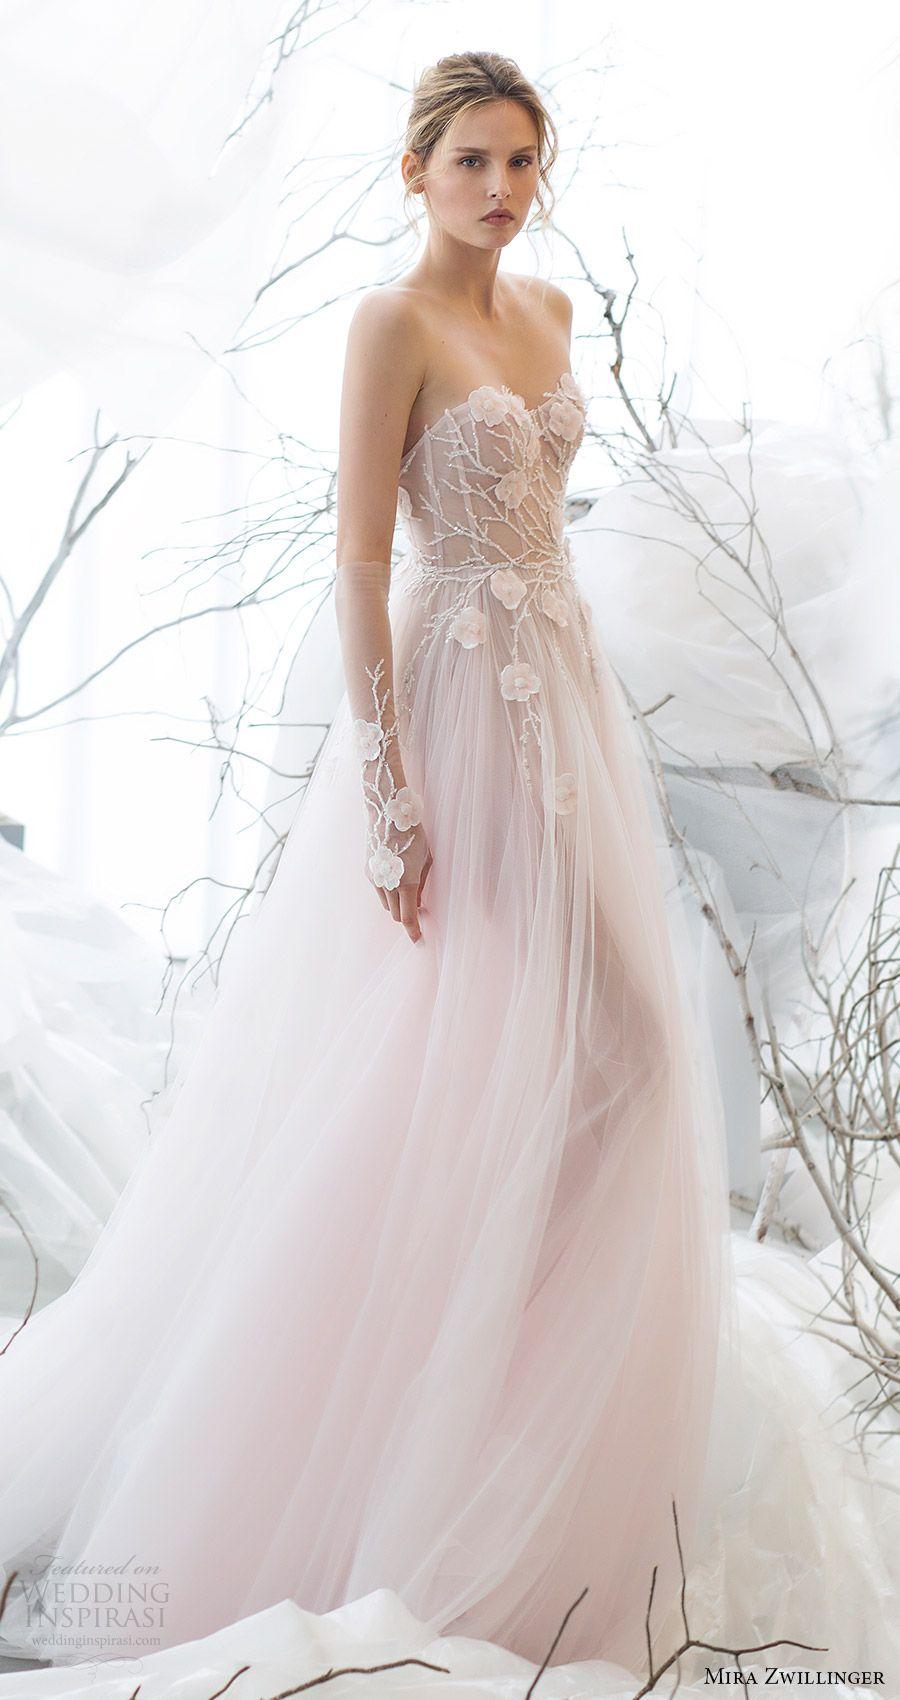 Mira Zwillinger 2017 Wedding Whisper Of Blossom Bridal Collection